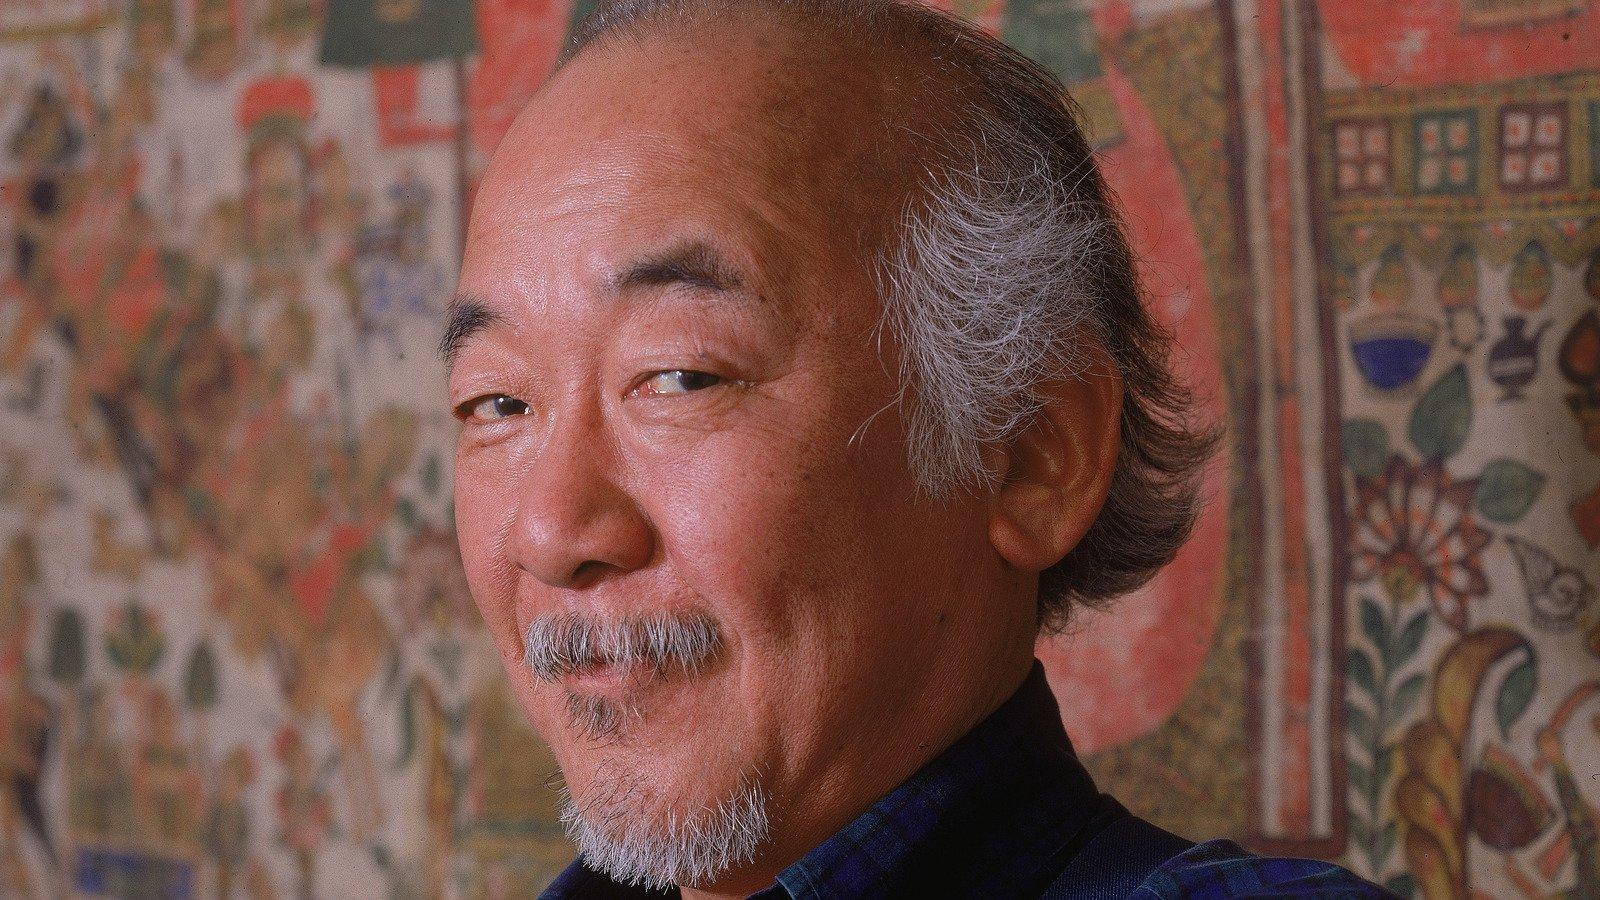 The tragic real-life story of the actor who played Mr. Miyagi